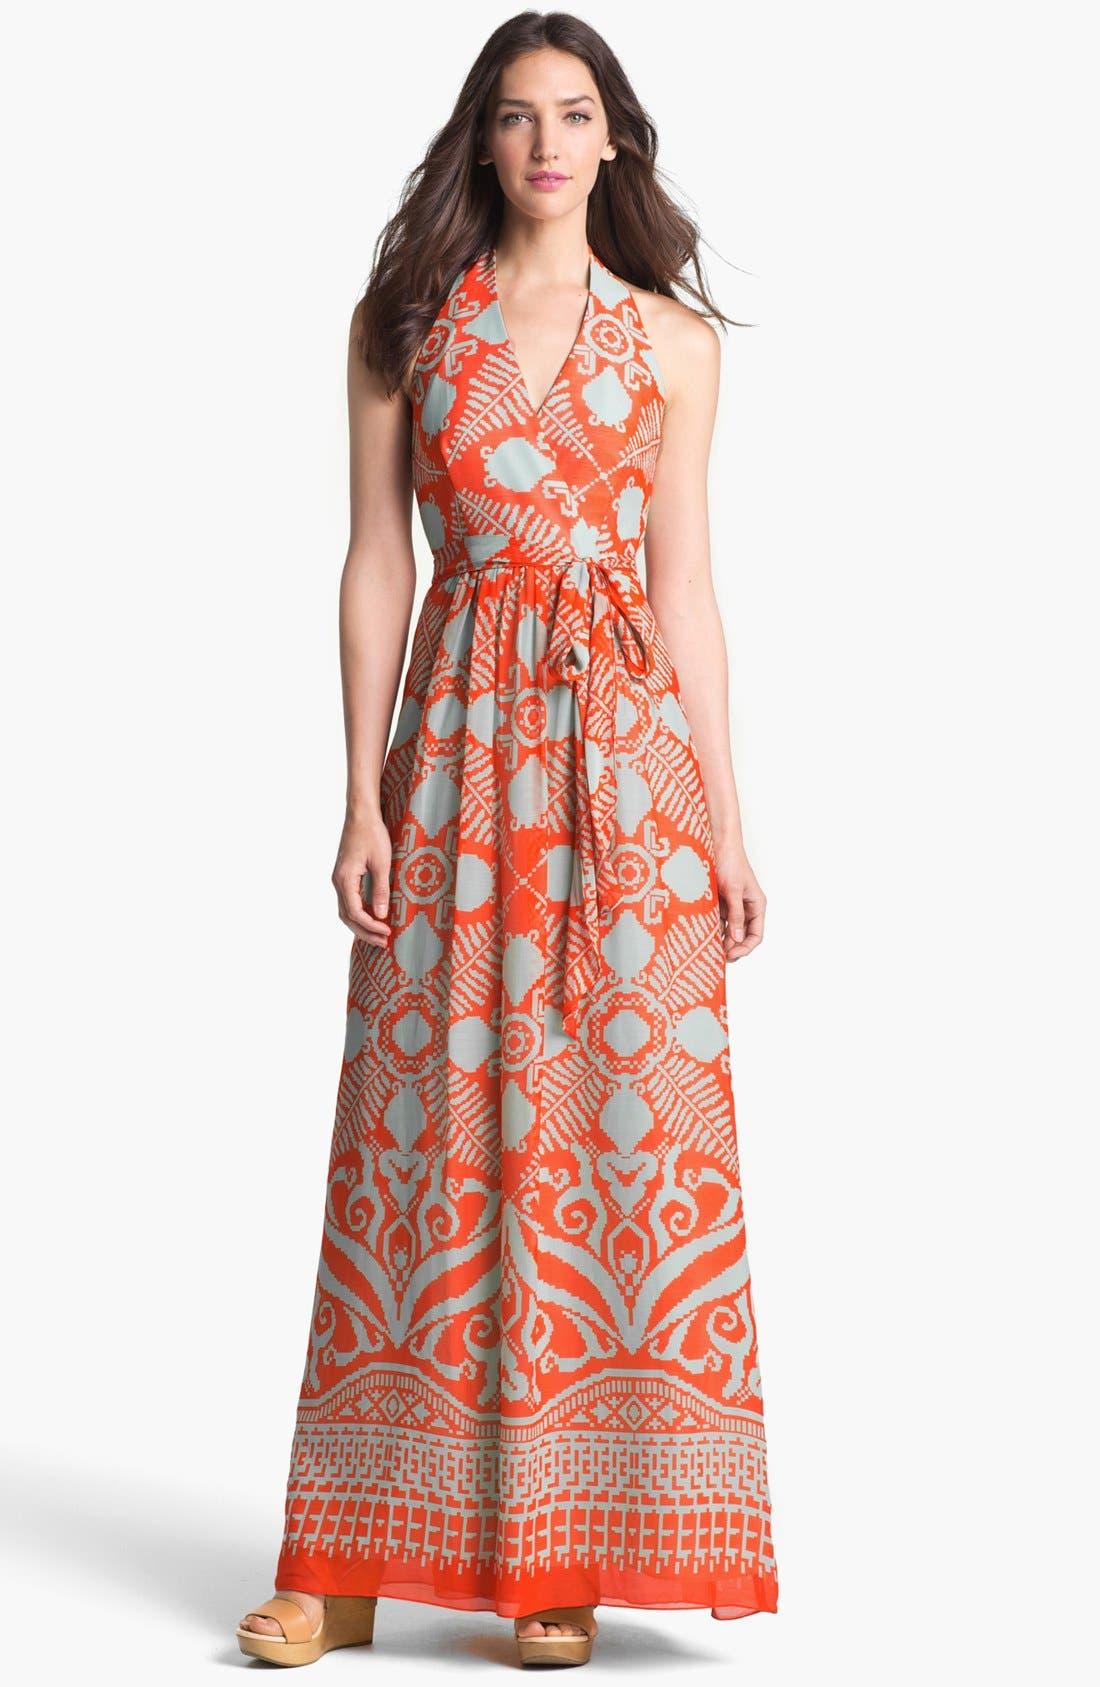 Main Image - Milly 'Gustavia' Cotton & Silk Halter Dress